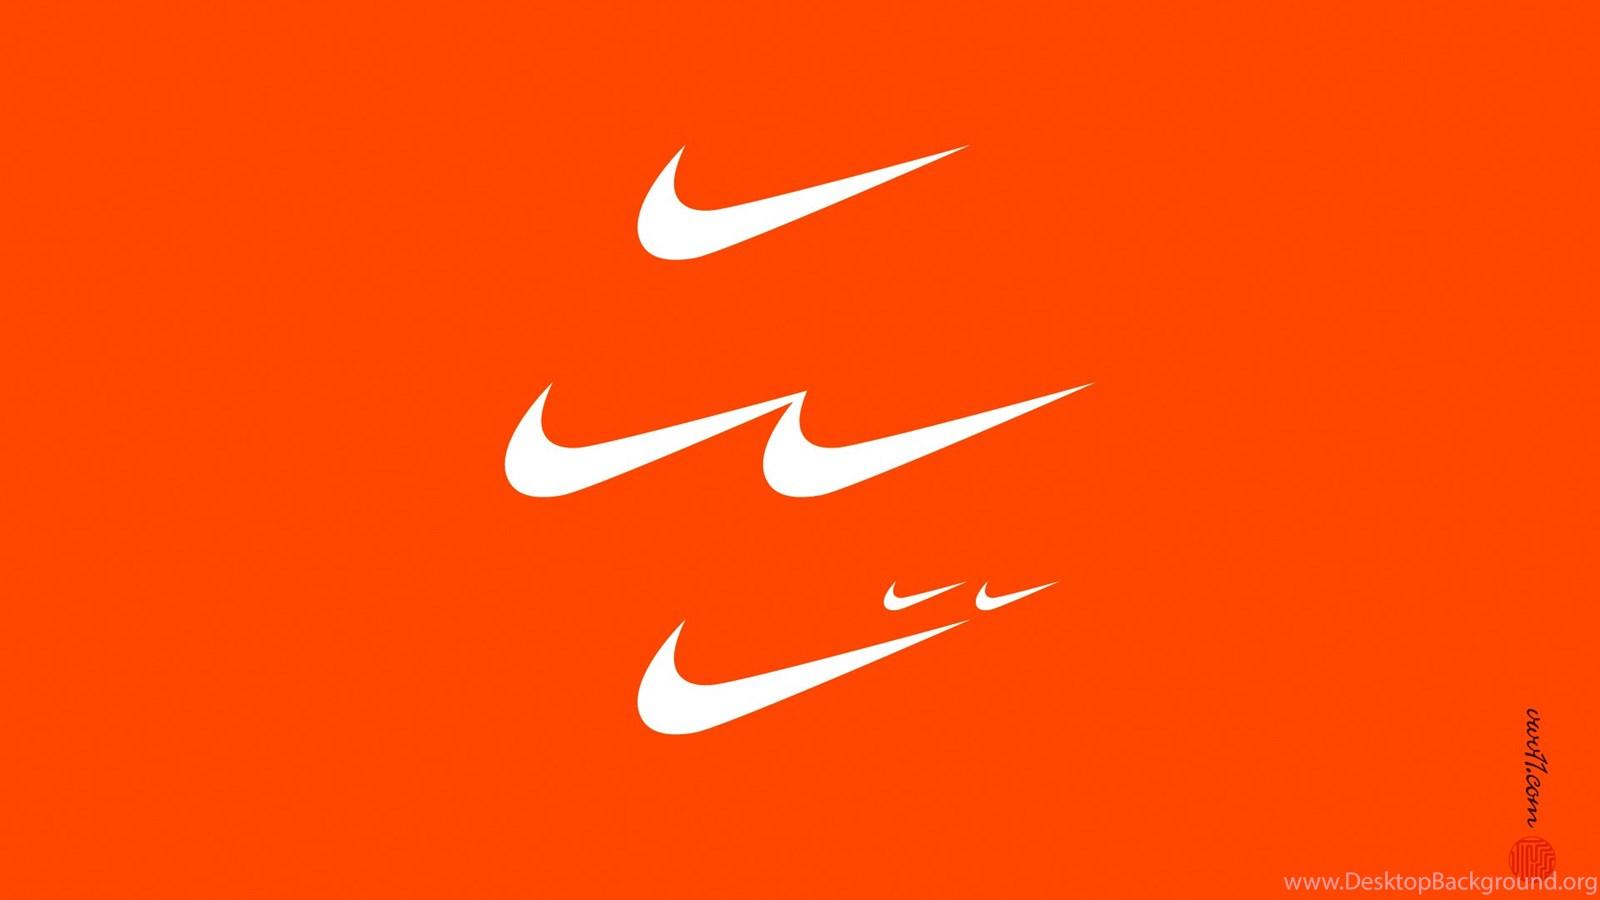 Nike Wallpapers Free Full Hd Wallpaper Widescreen Hq